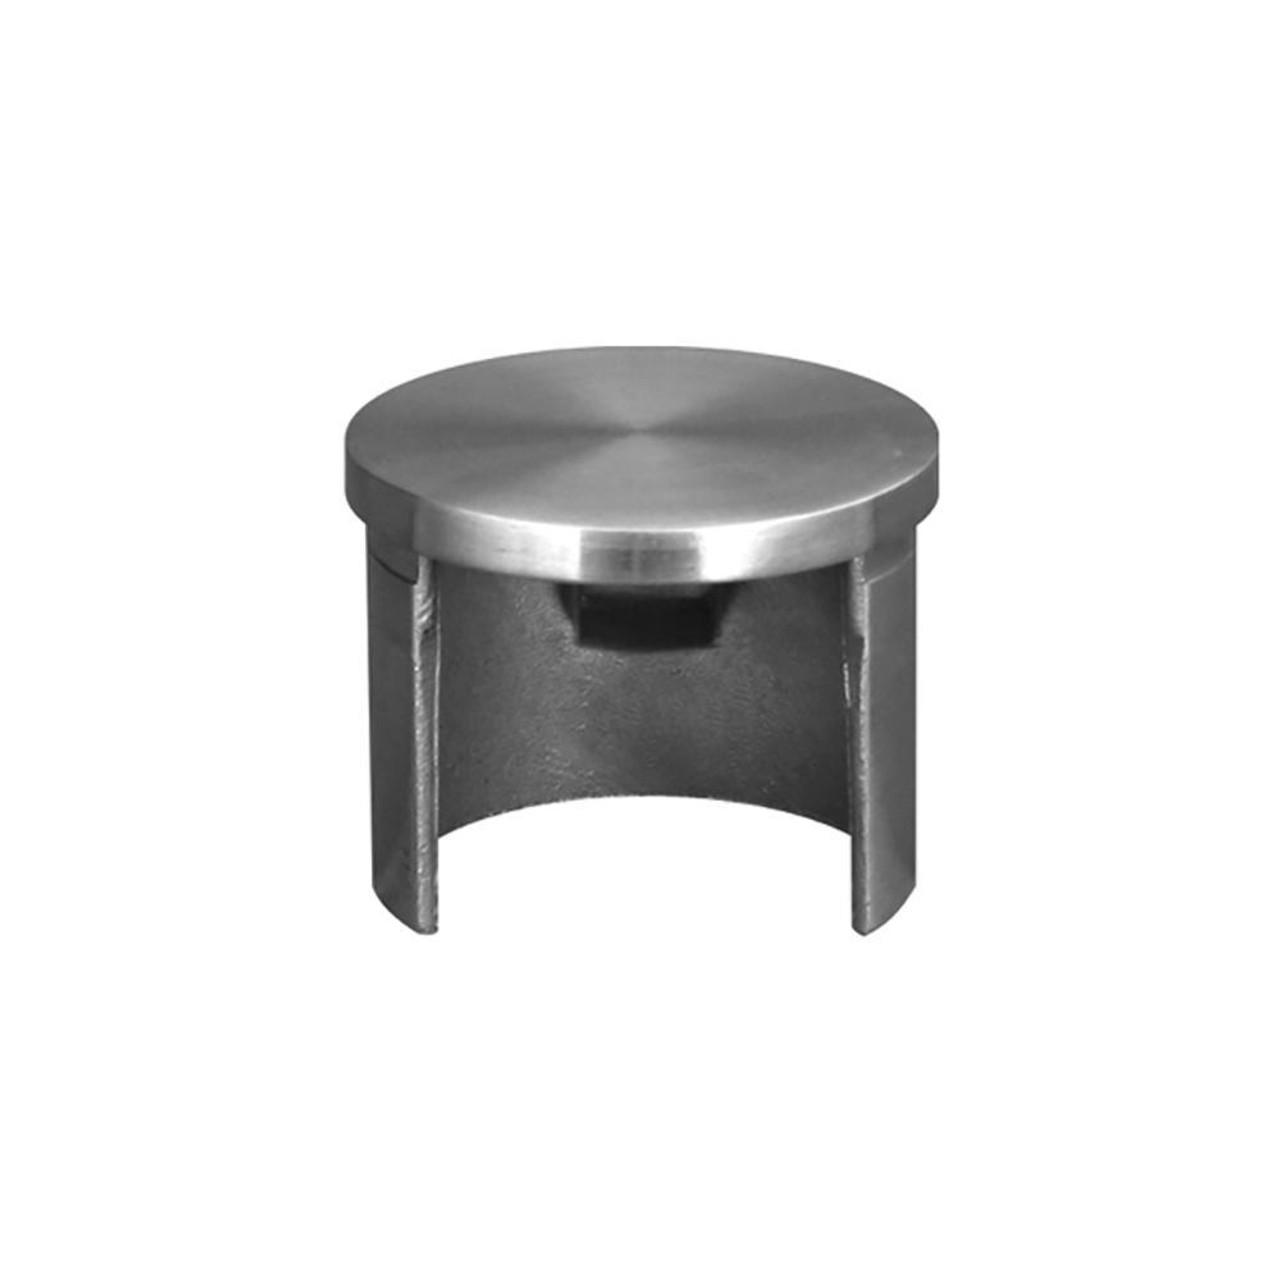 Flat End Cap for Round Glass Cap Rail